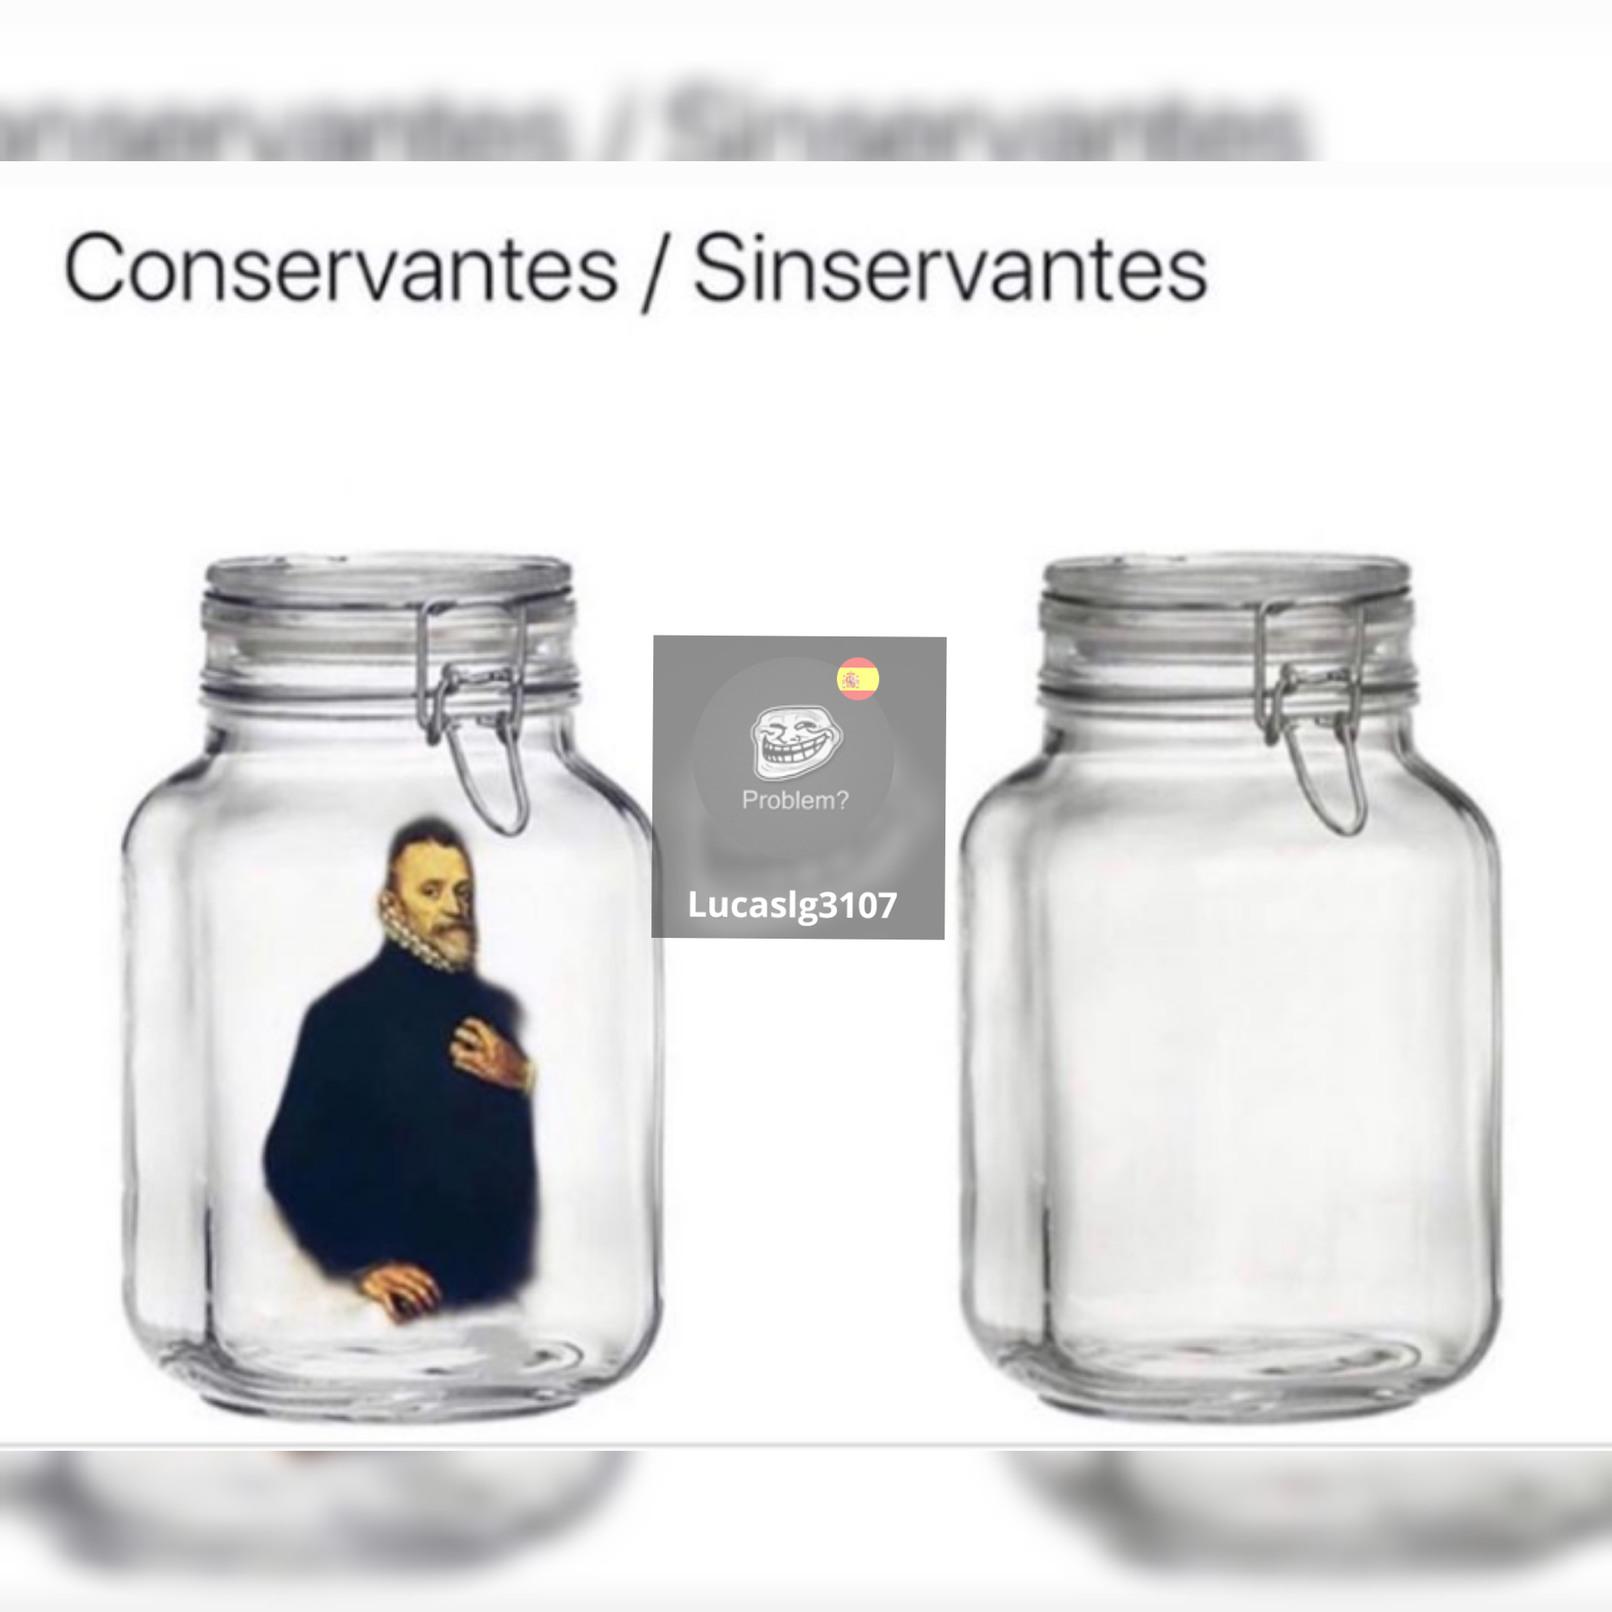 Servantes - meme